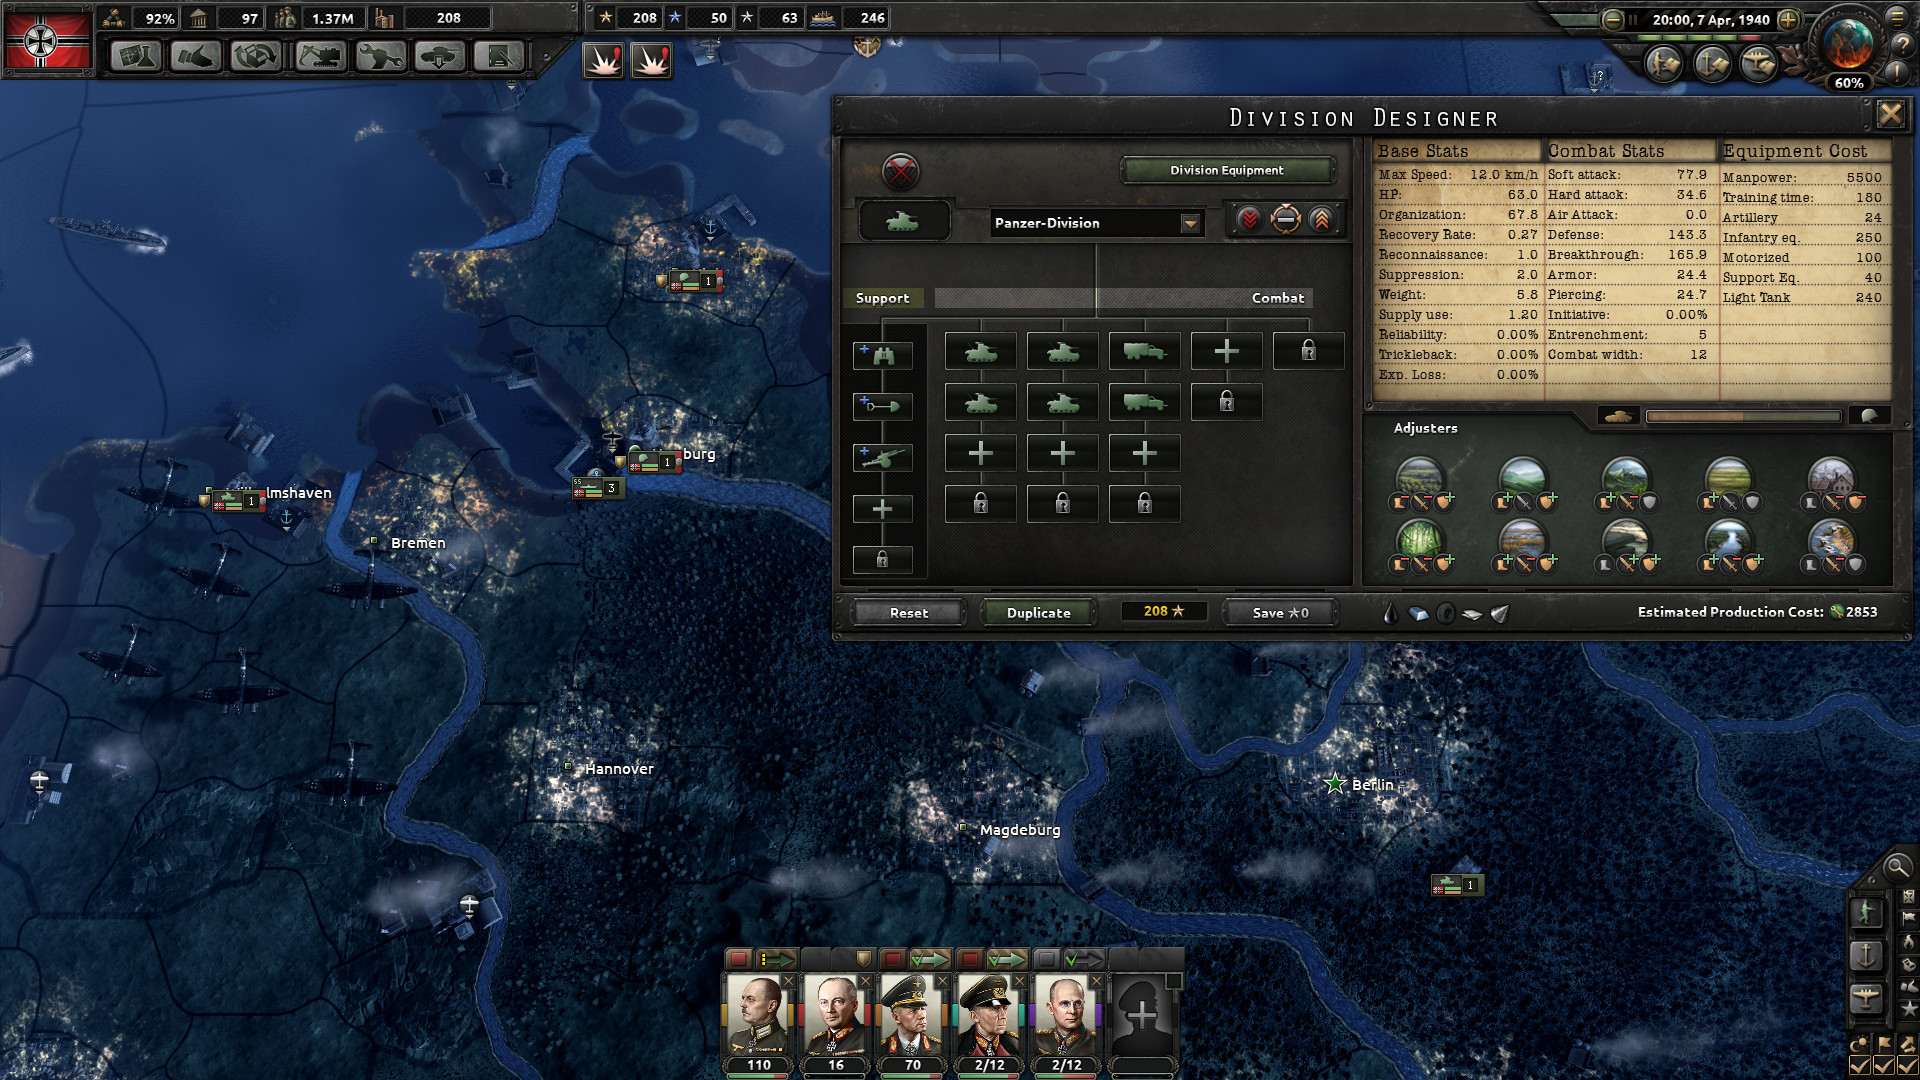 Hearts of Iron IV Screenshot 3